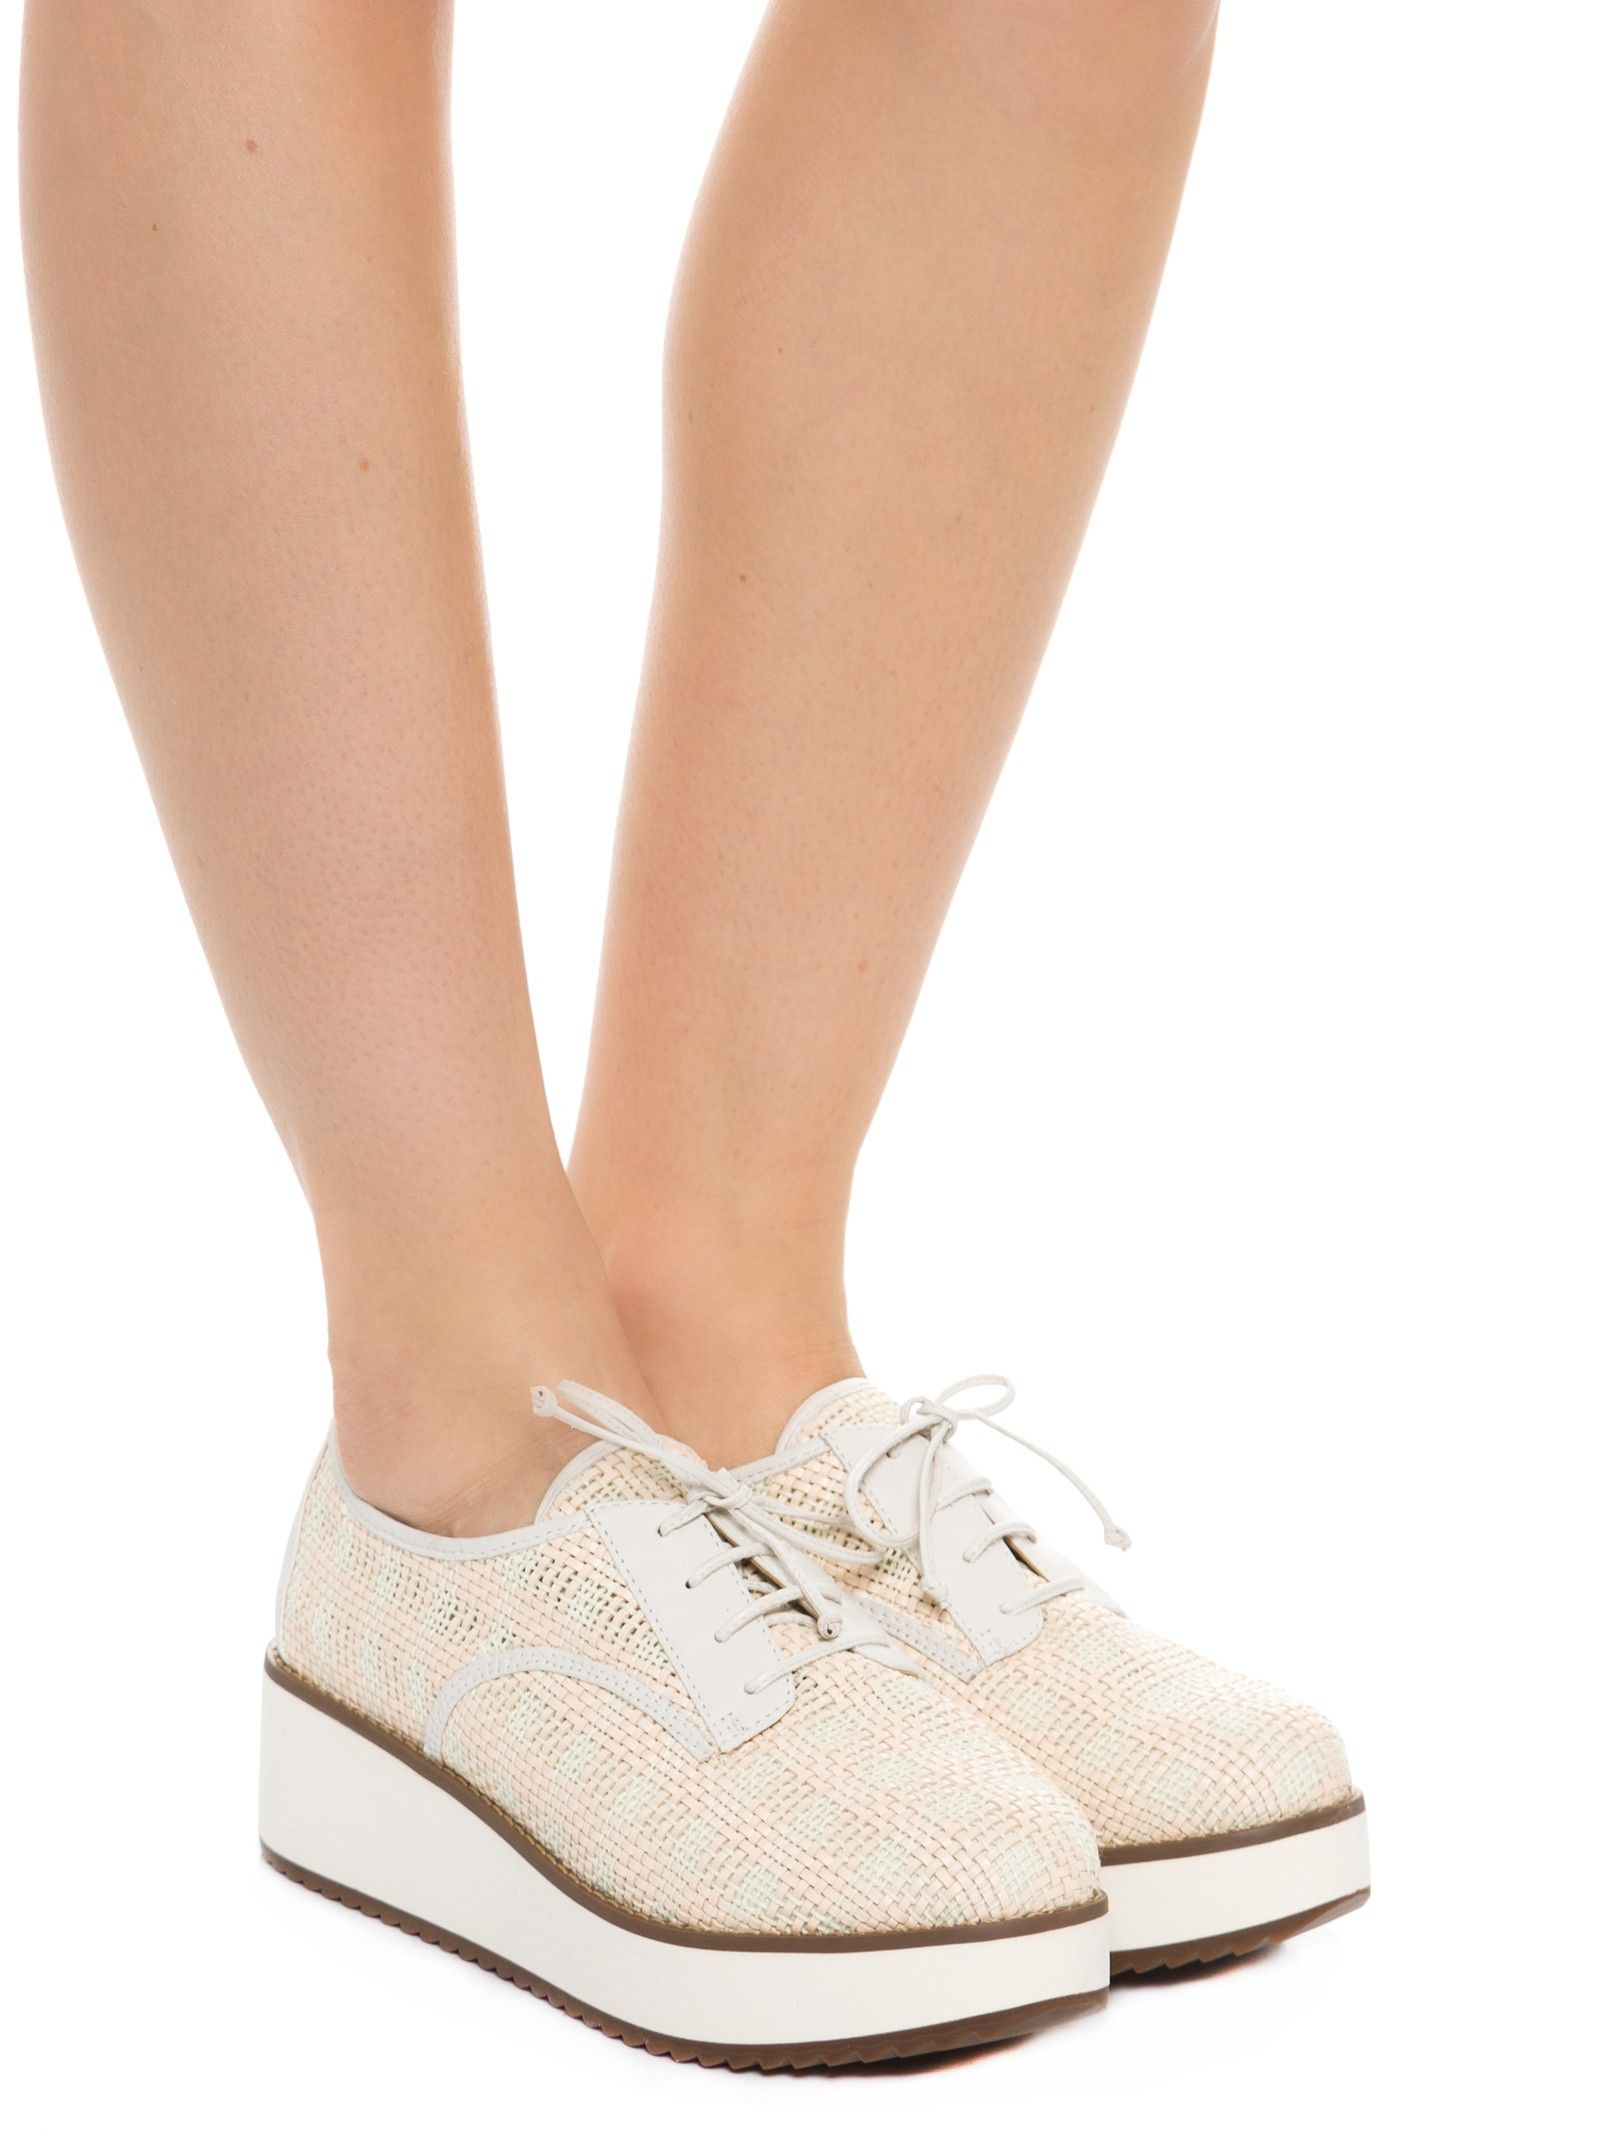 f209bf5dd5 Sapato Fechado Salto Baixo Tresse Soft - Schutz - Off White - Shop2gether